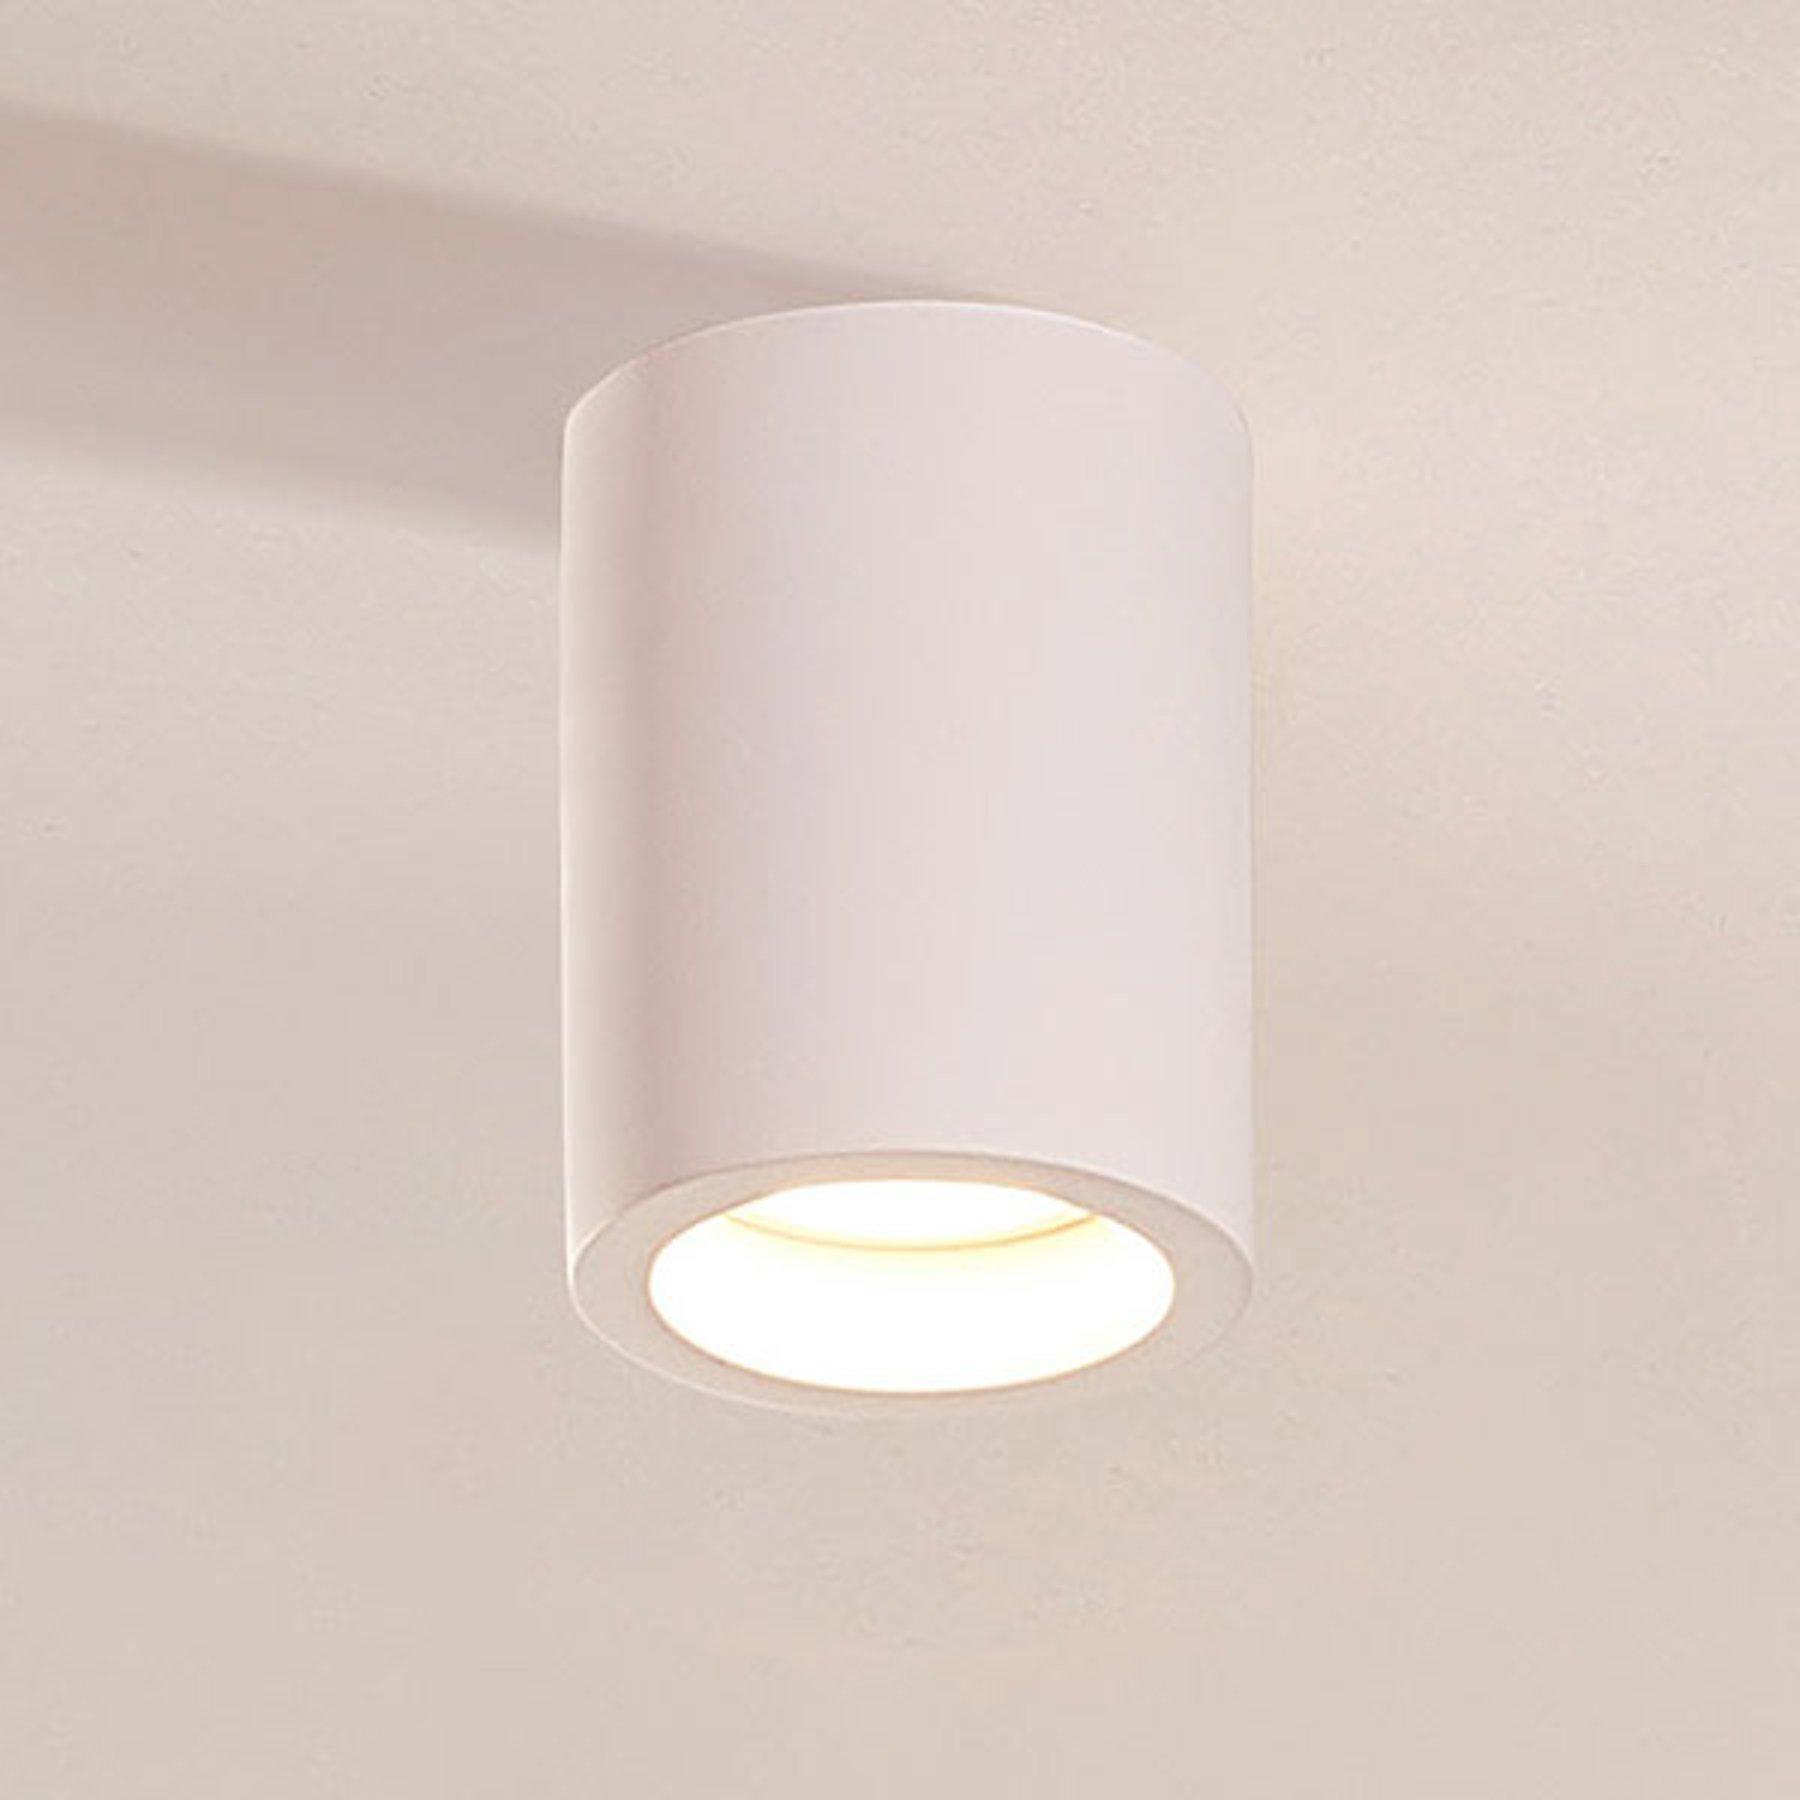 Kompakt LED-downlight Annelies, Easydim